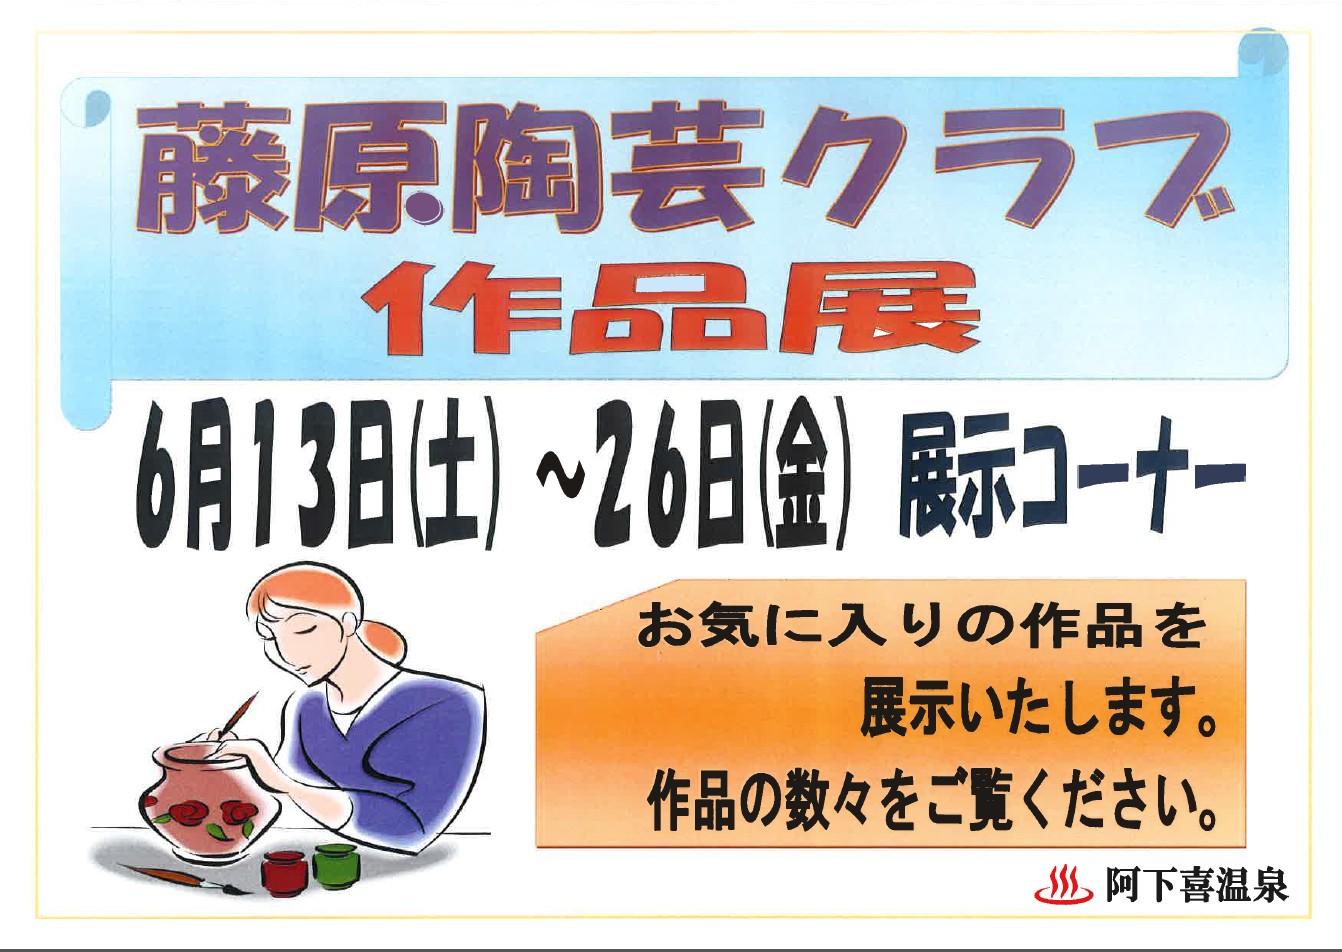 http://www.ajisainosato.com/info/images/2015y06m09d_135622920.jpg